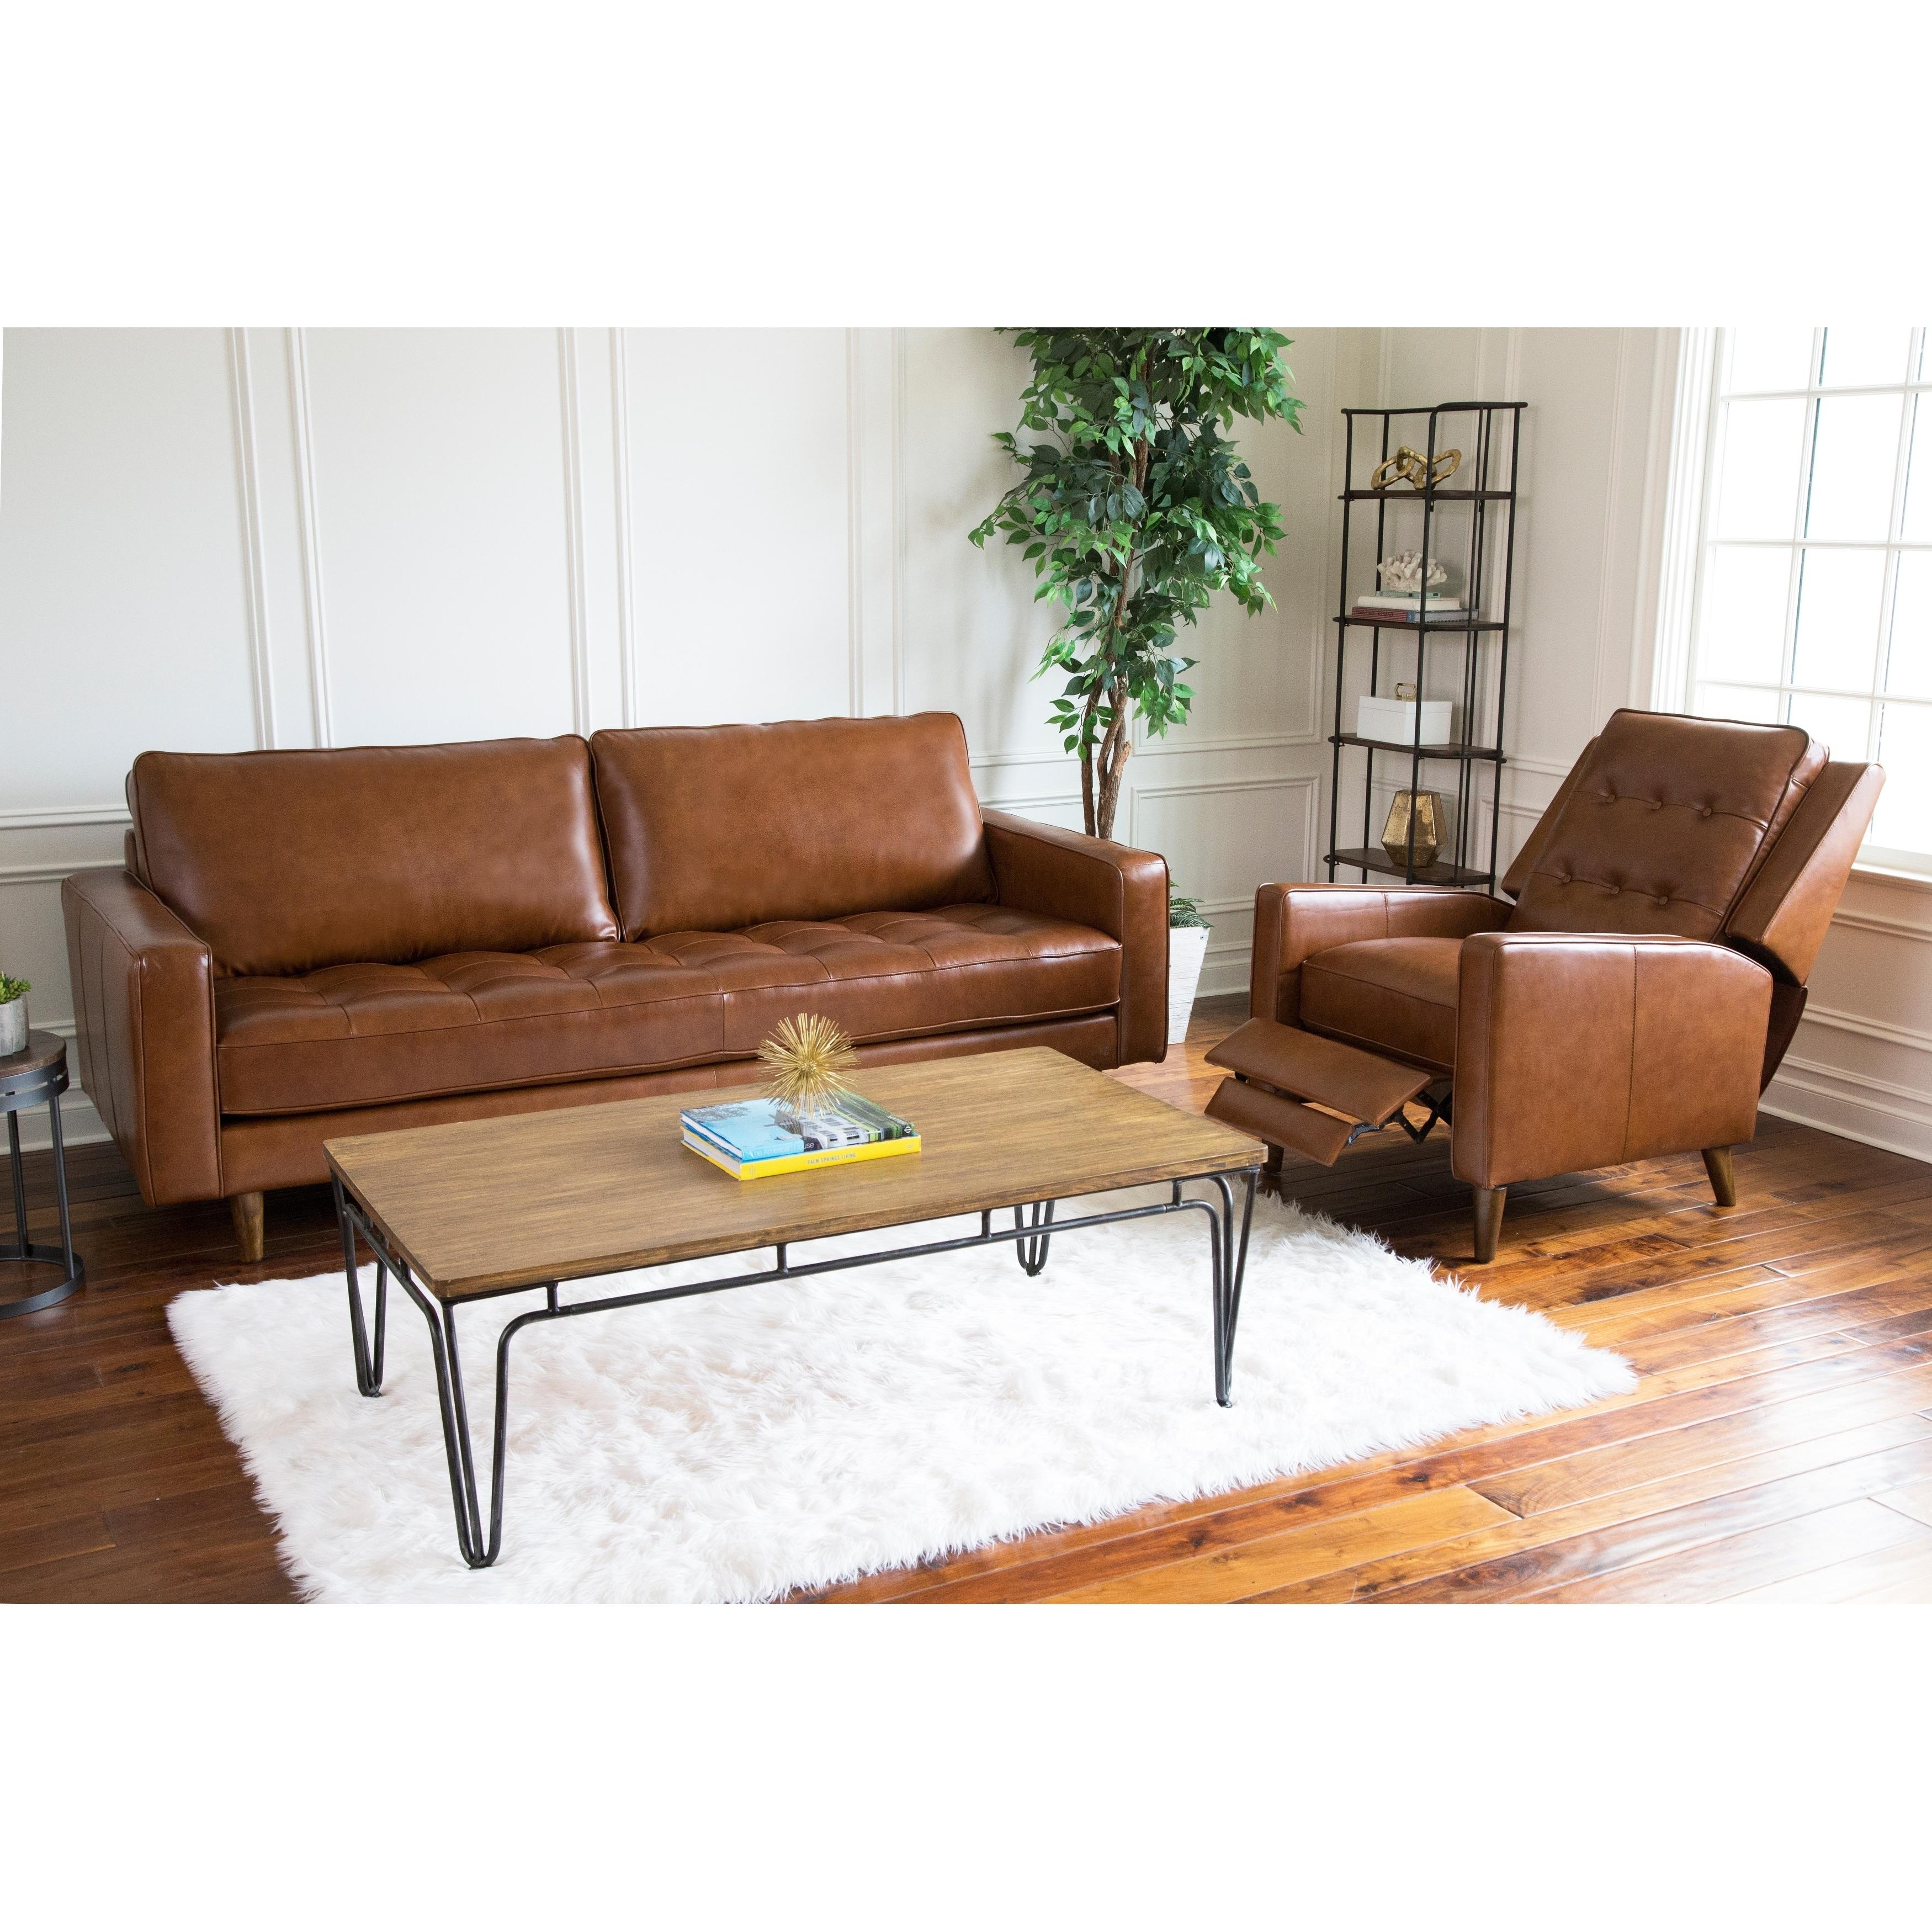 Abbyson Holloway Mid Century Leather Sofa and Recliner Set